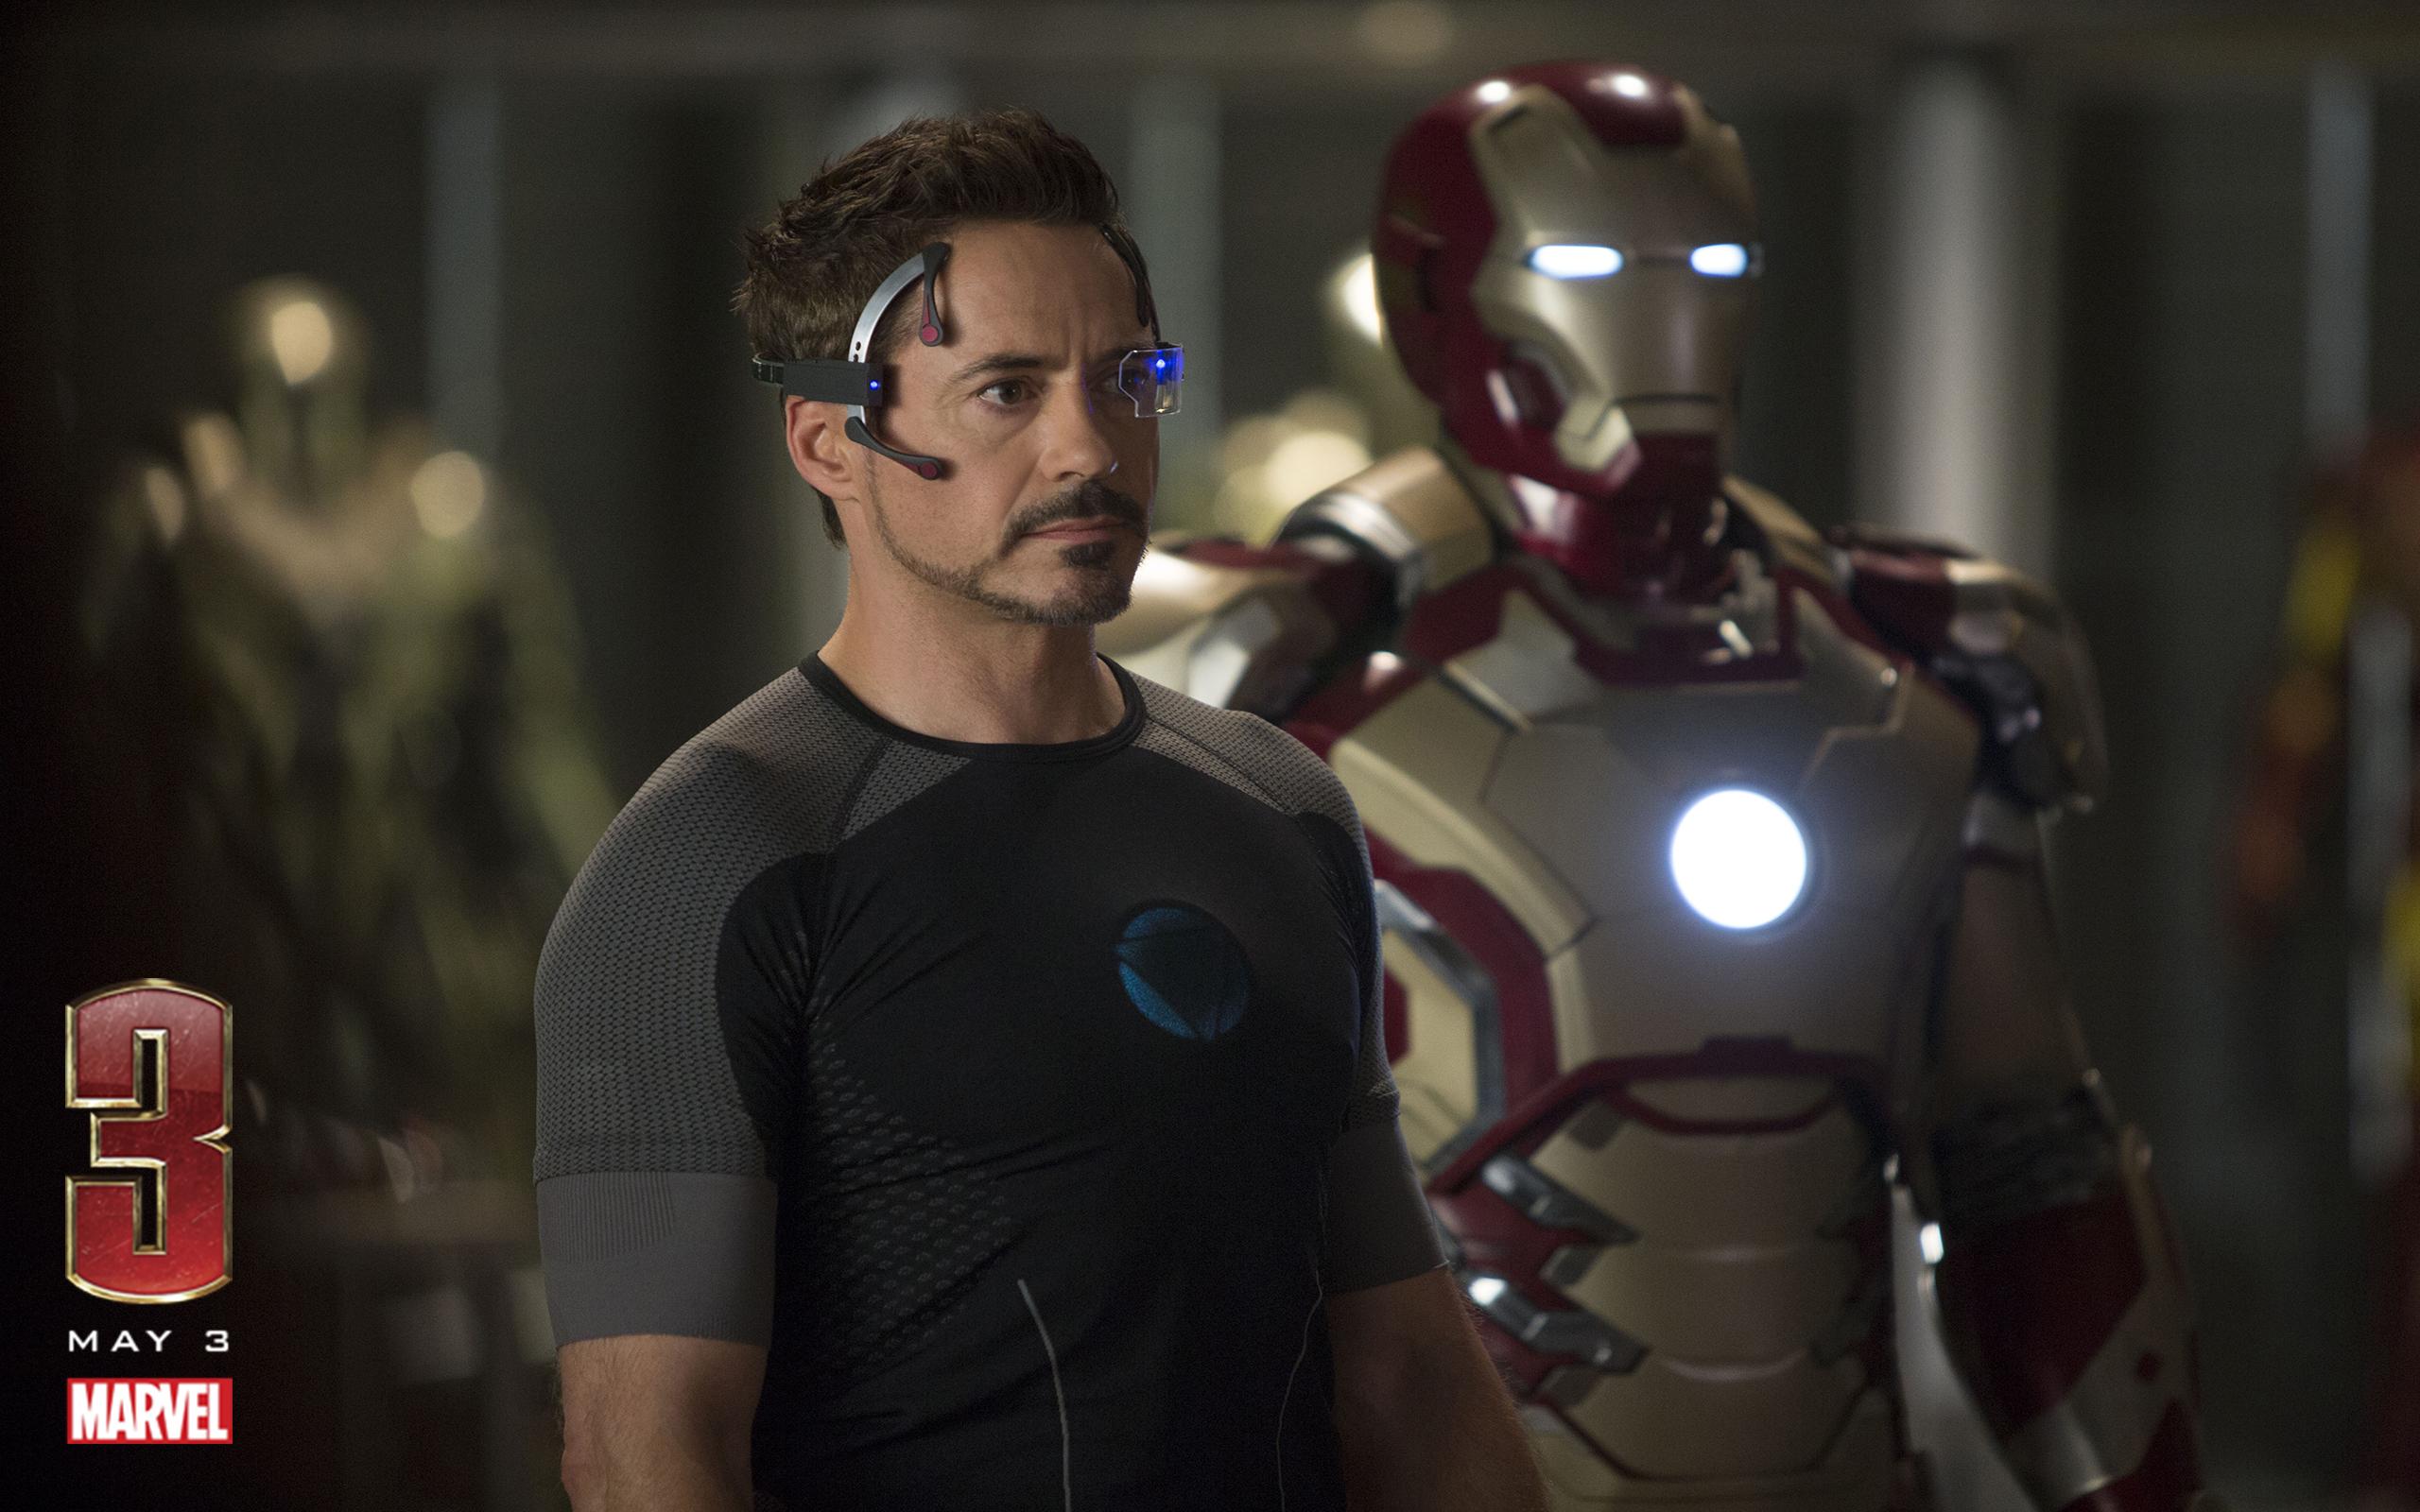 Iron Man 3 Hd Wallpaper Background Image 2560x1600 Id334985